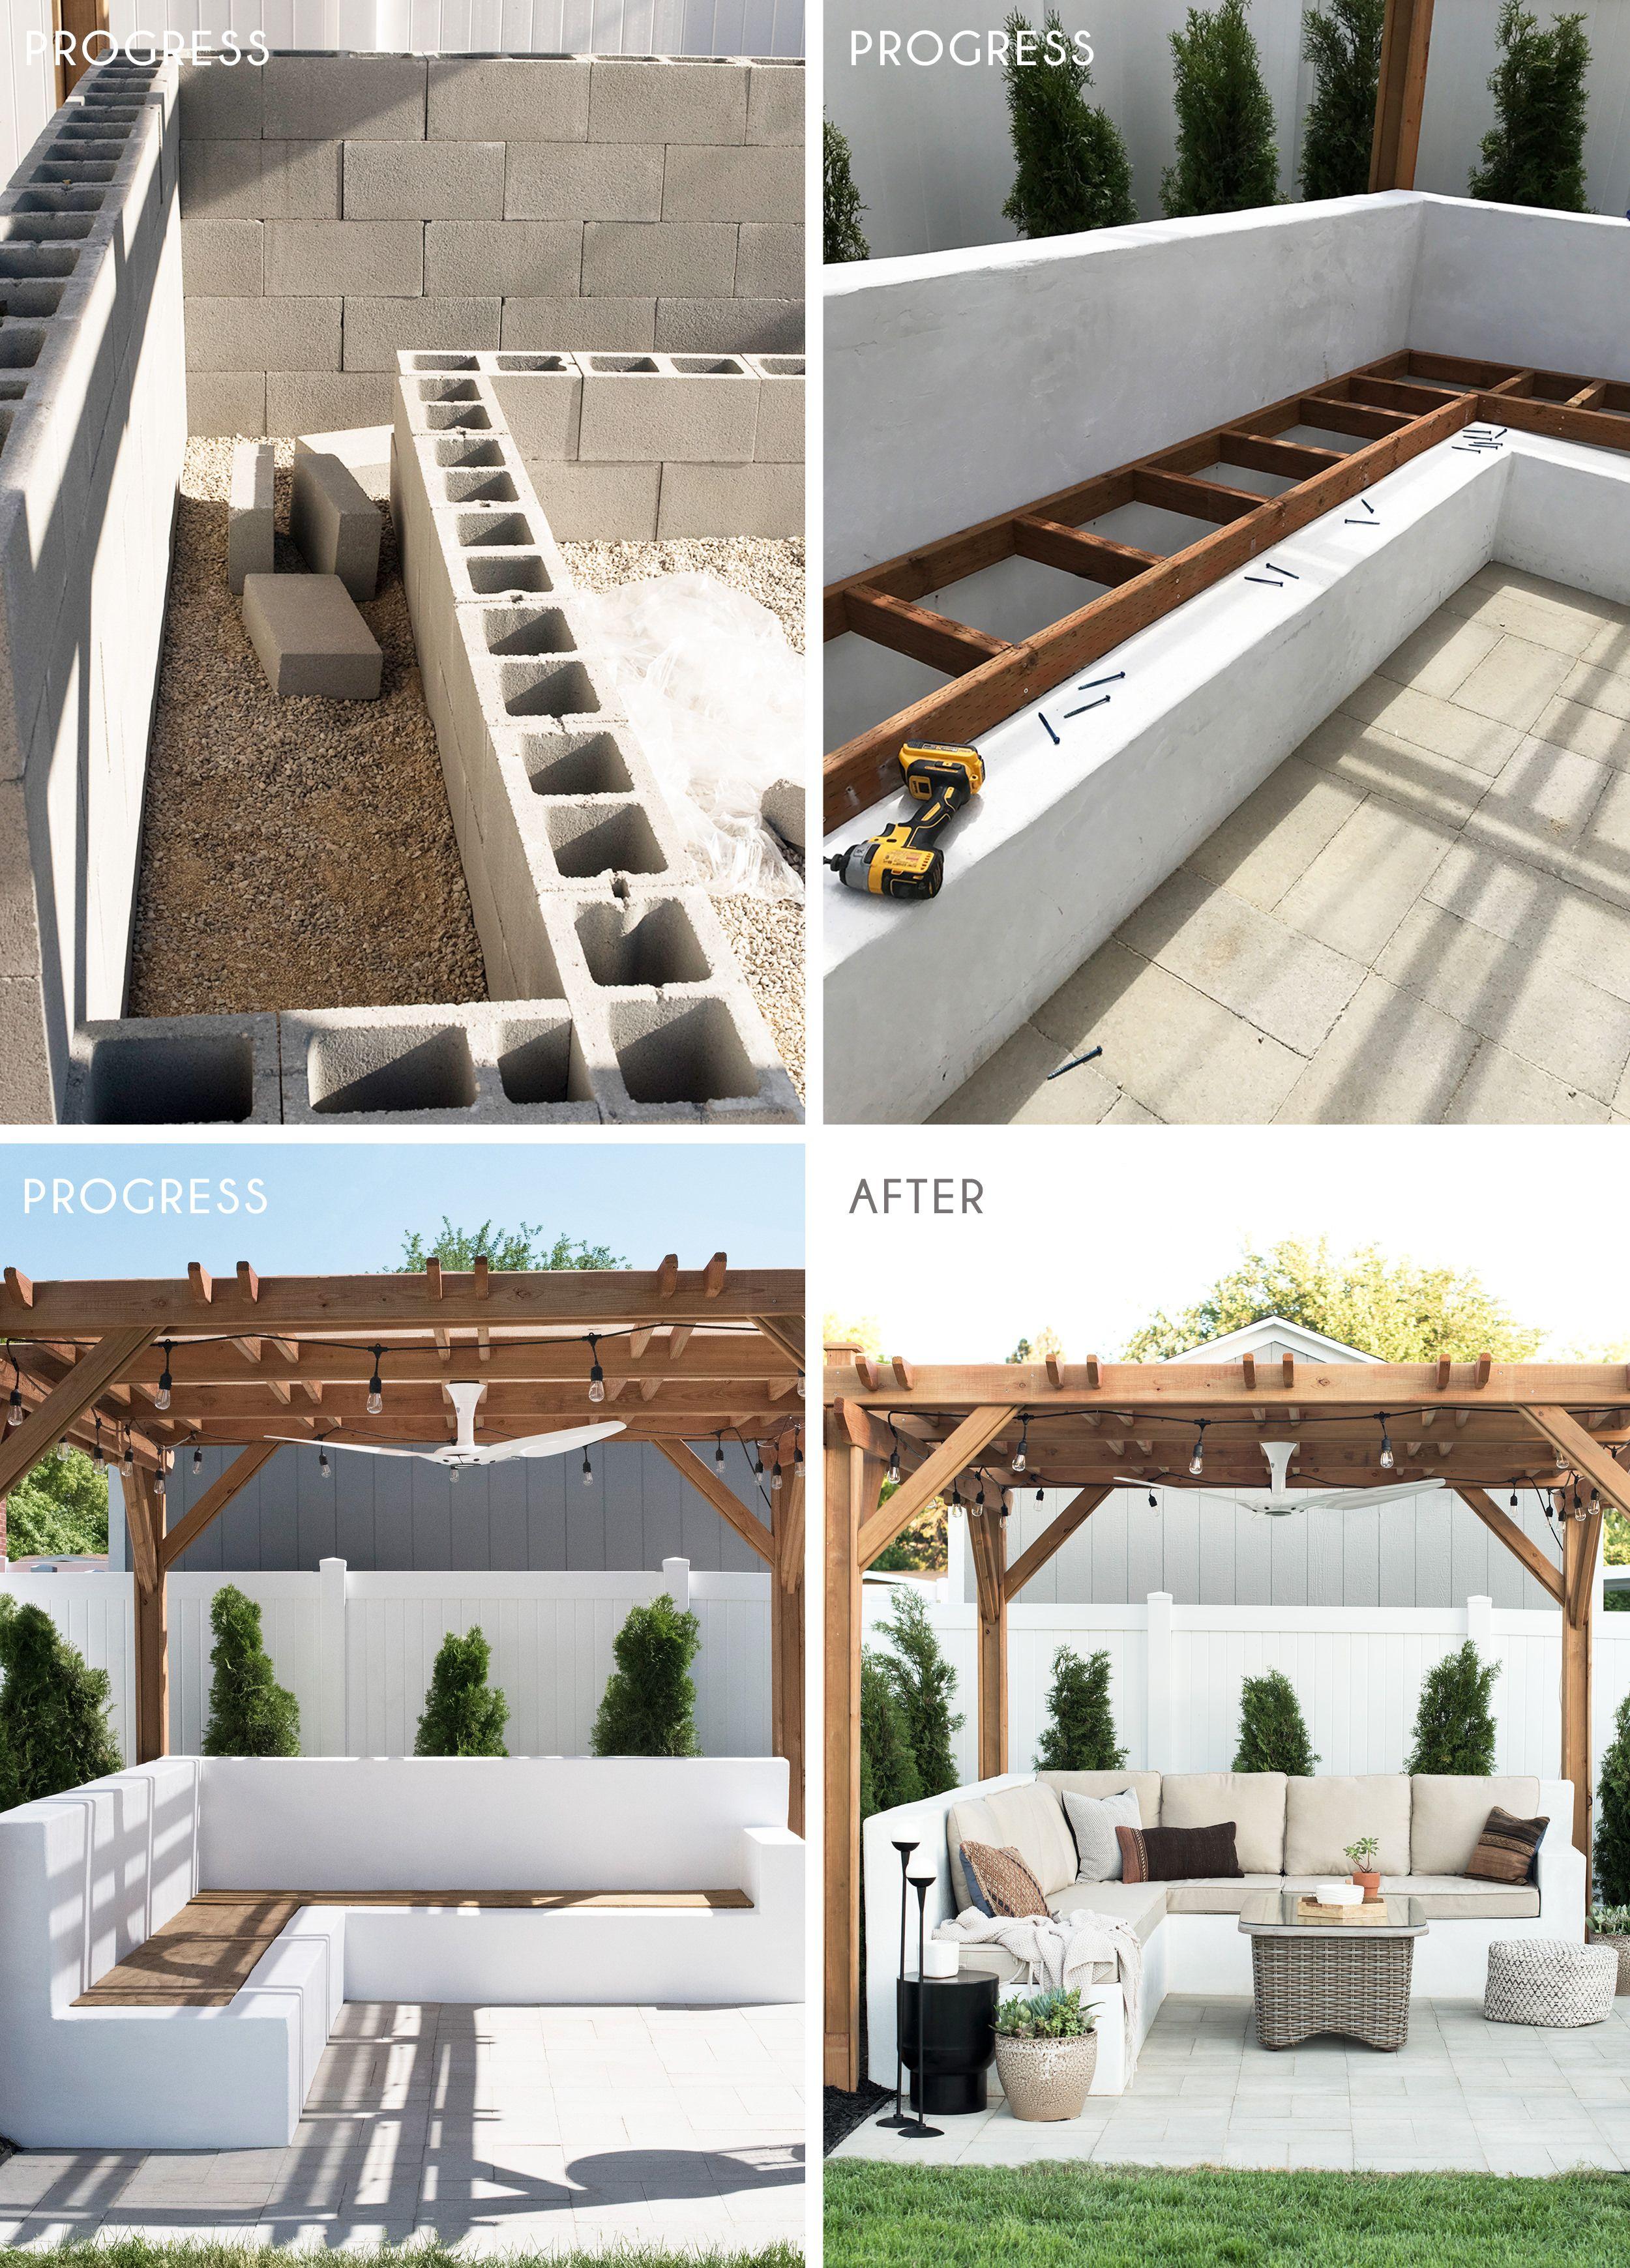 10 Doable Diy Ideas To Transform Your Backyard Hardscape Backyard Diy Backyard Backyard Design